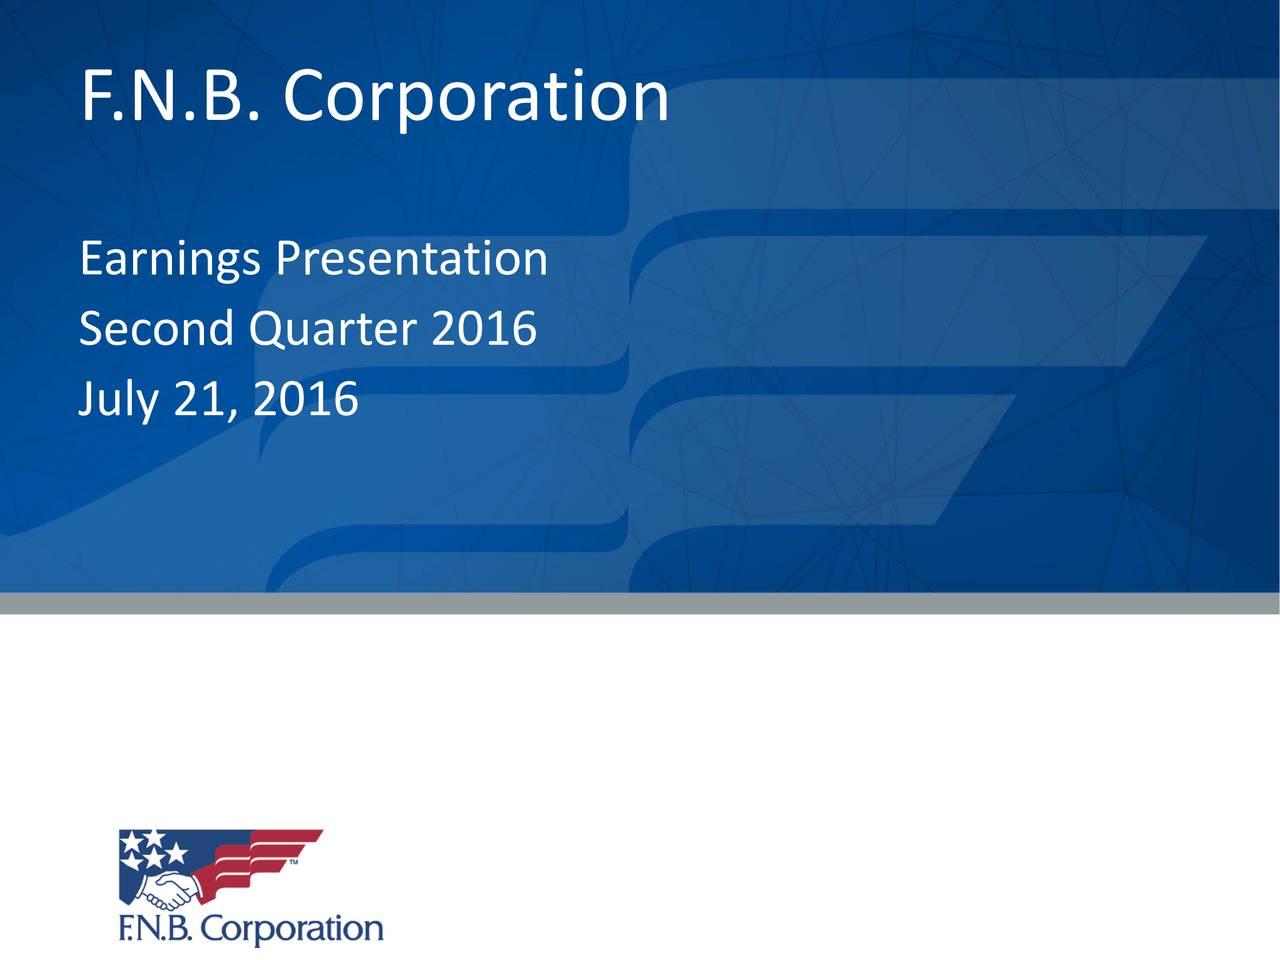 Earnings Presentation Second Quarter 2016 July 21, 2016